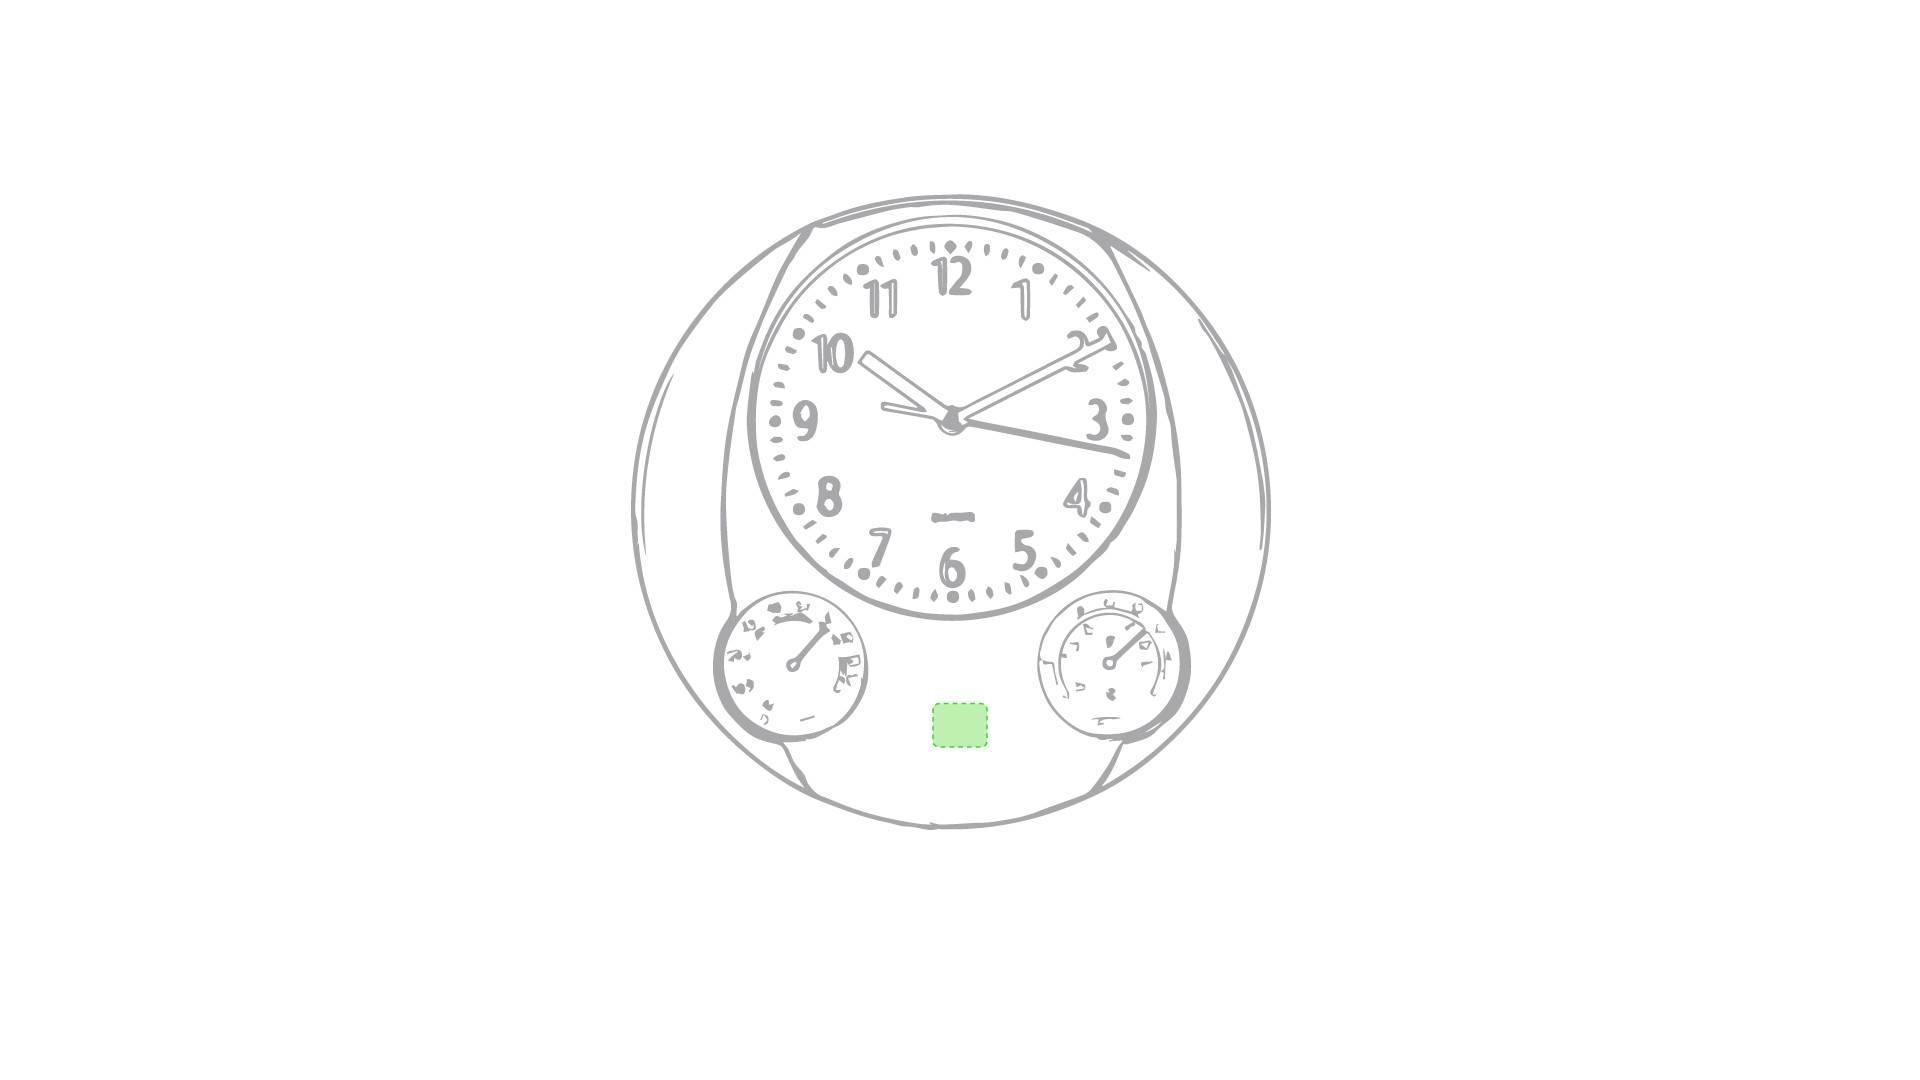 Reloj de pared con termómetro 5